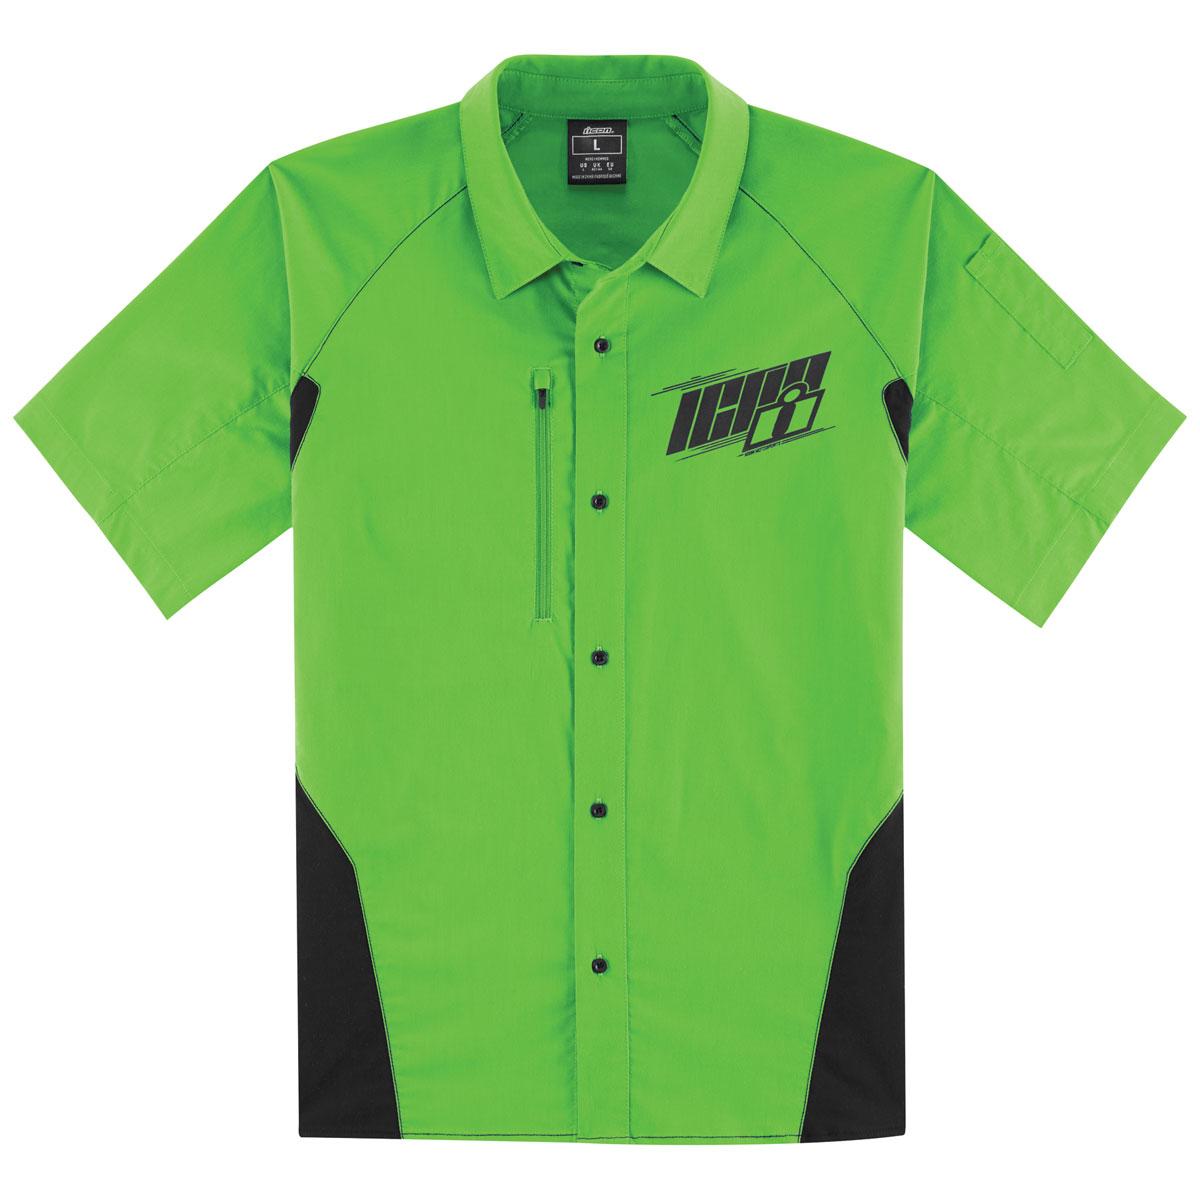 ICON Men's Overlord Green Shop Shirt